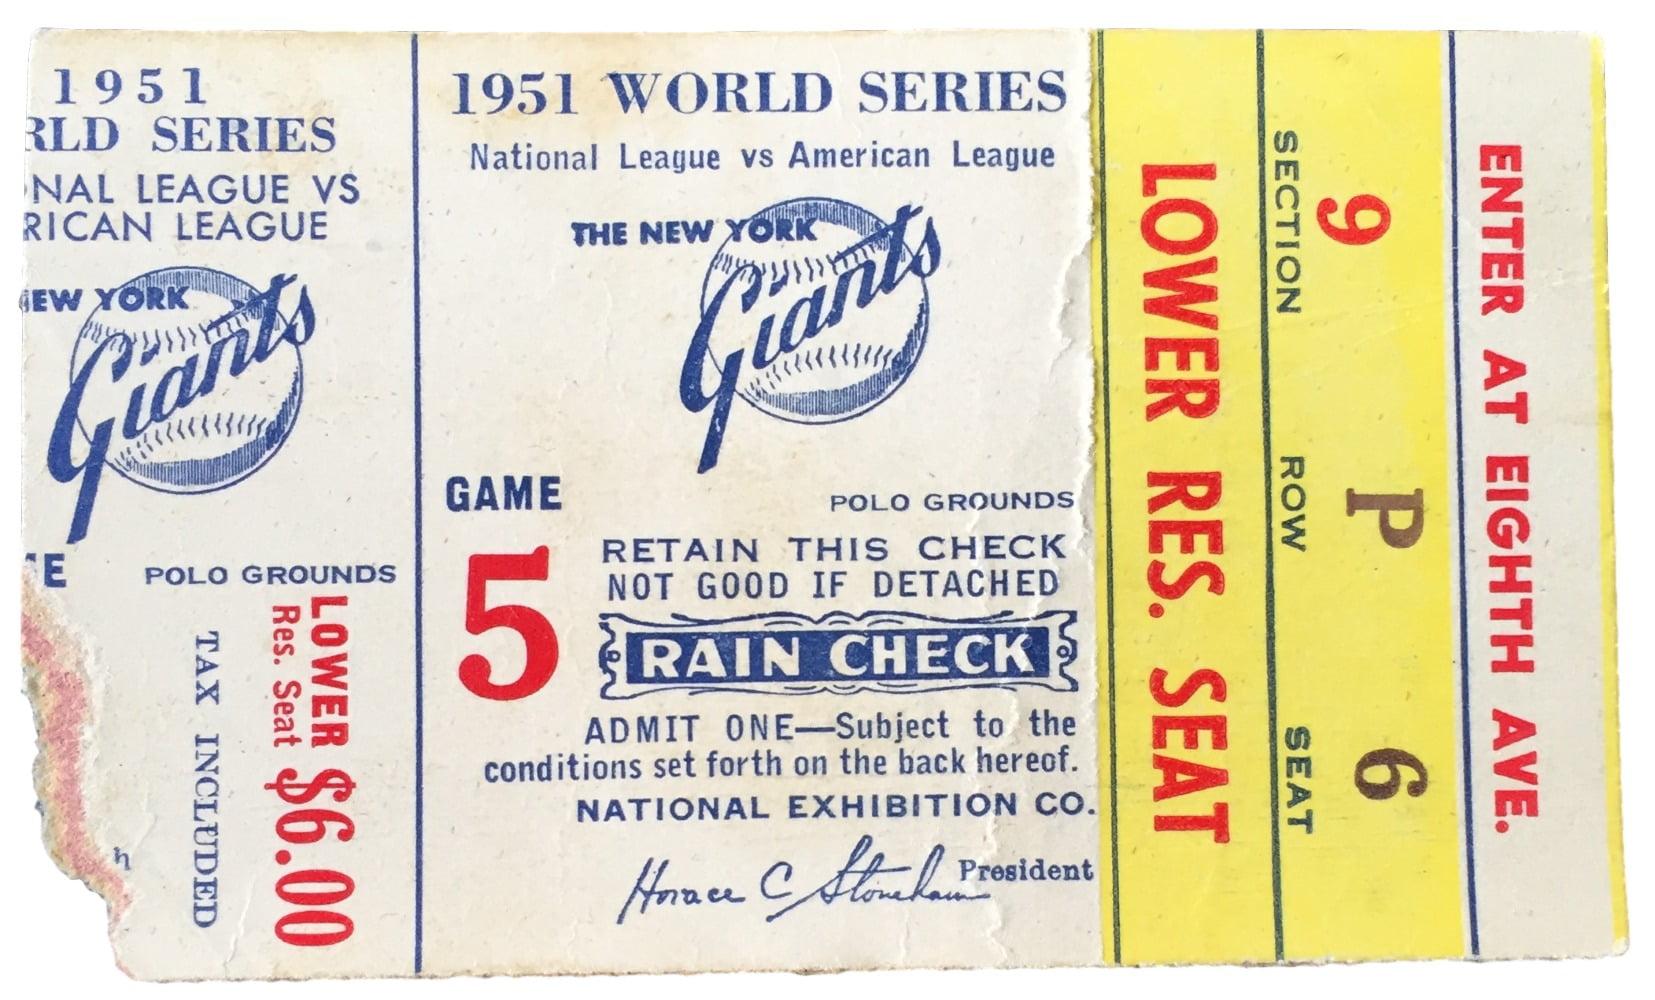 1951 World Series Game 5 Ticket Stub New York Yankees vs San Francisco Giants by Sports Integrity